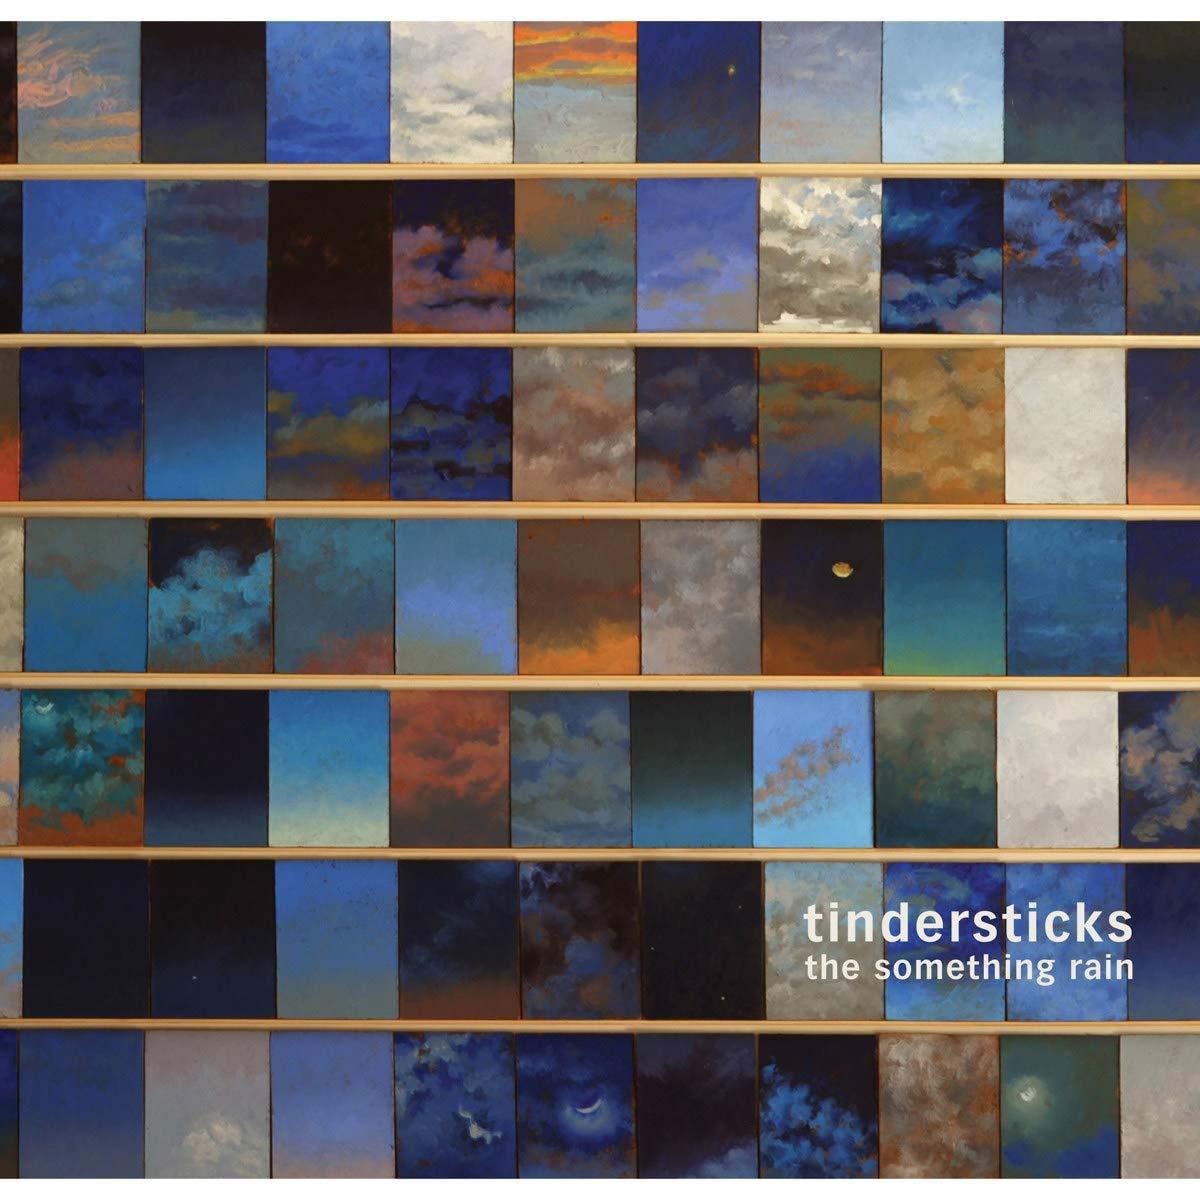 Tindersticks - The Something Rain / San Sebastian 2012 (2012) [FLAC] Download